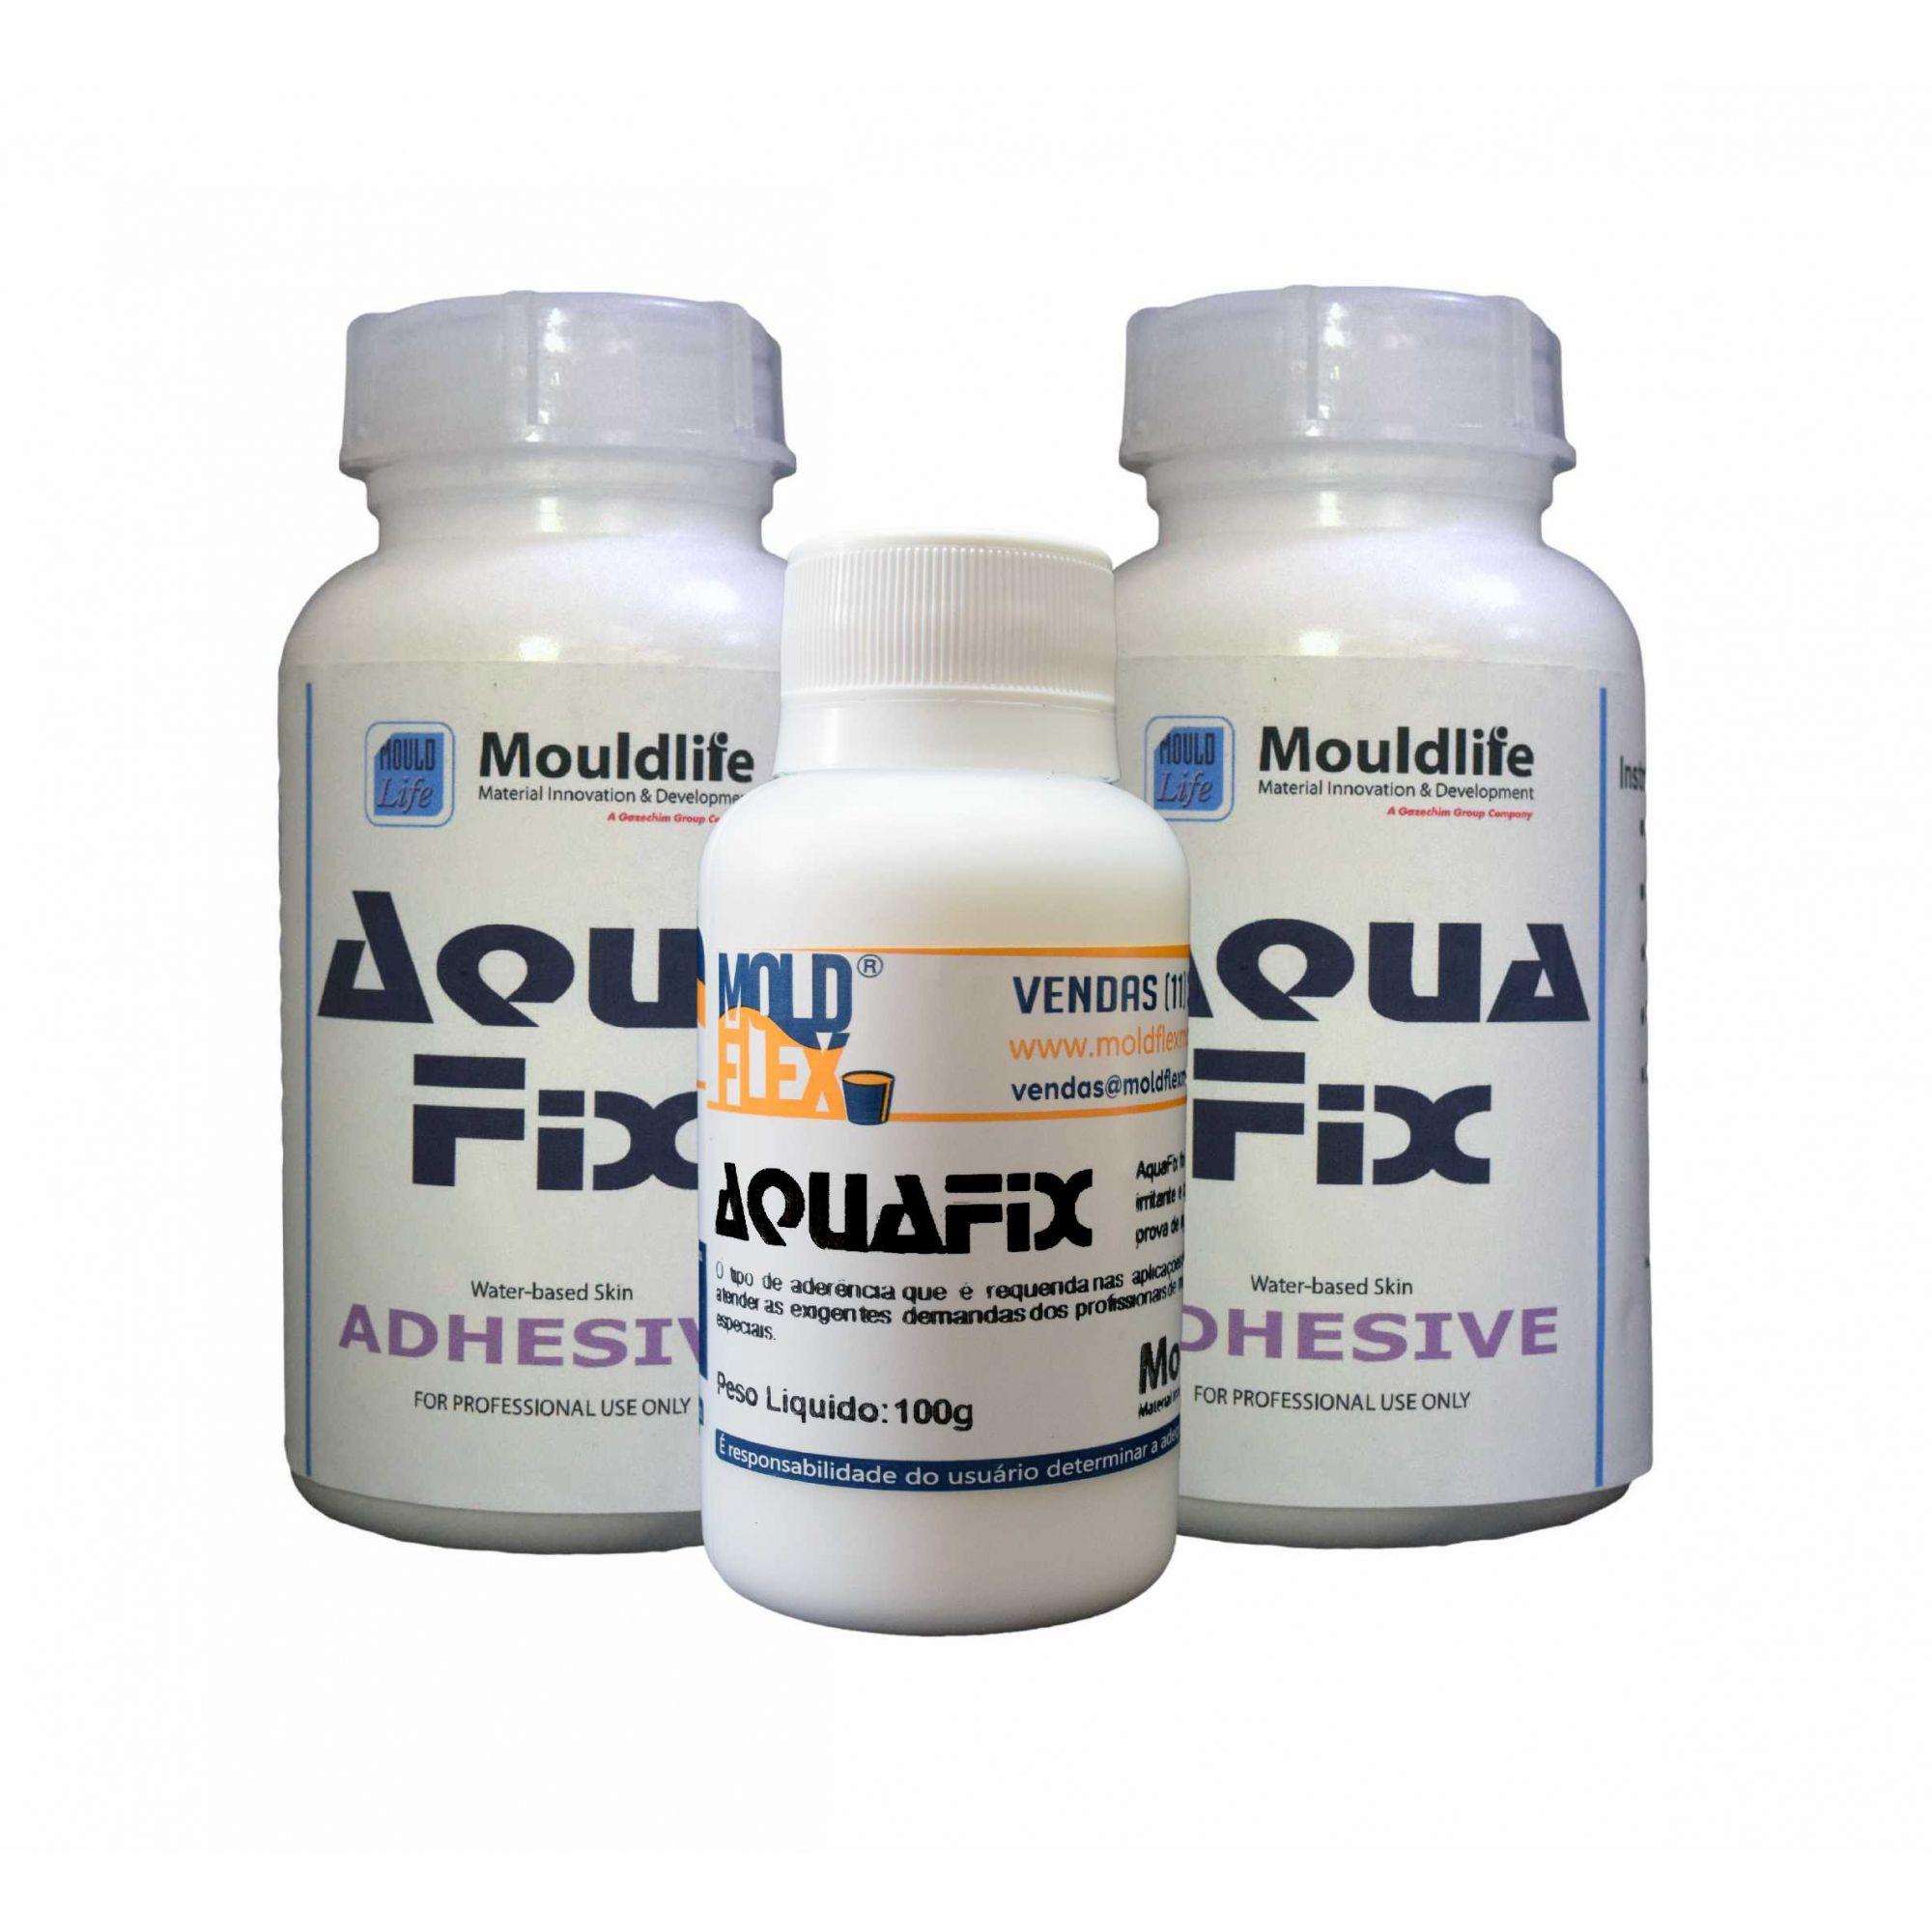 Aqua Fix - Adesivo a base d'água para próteses de silicone.